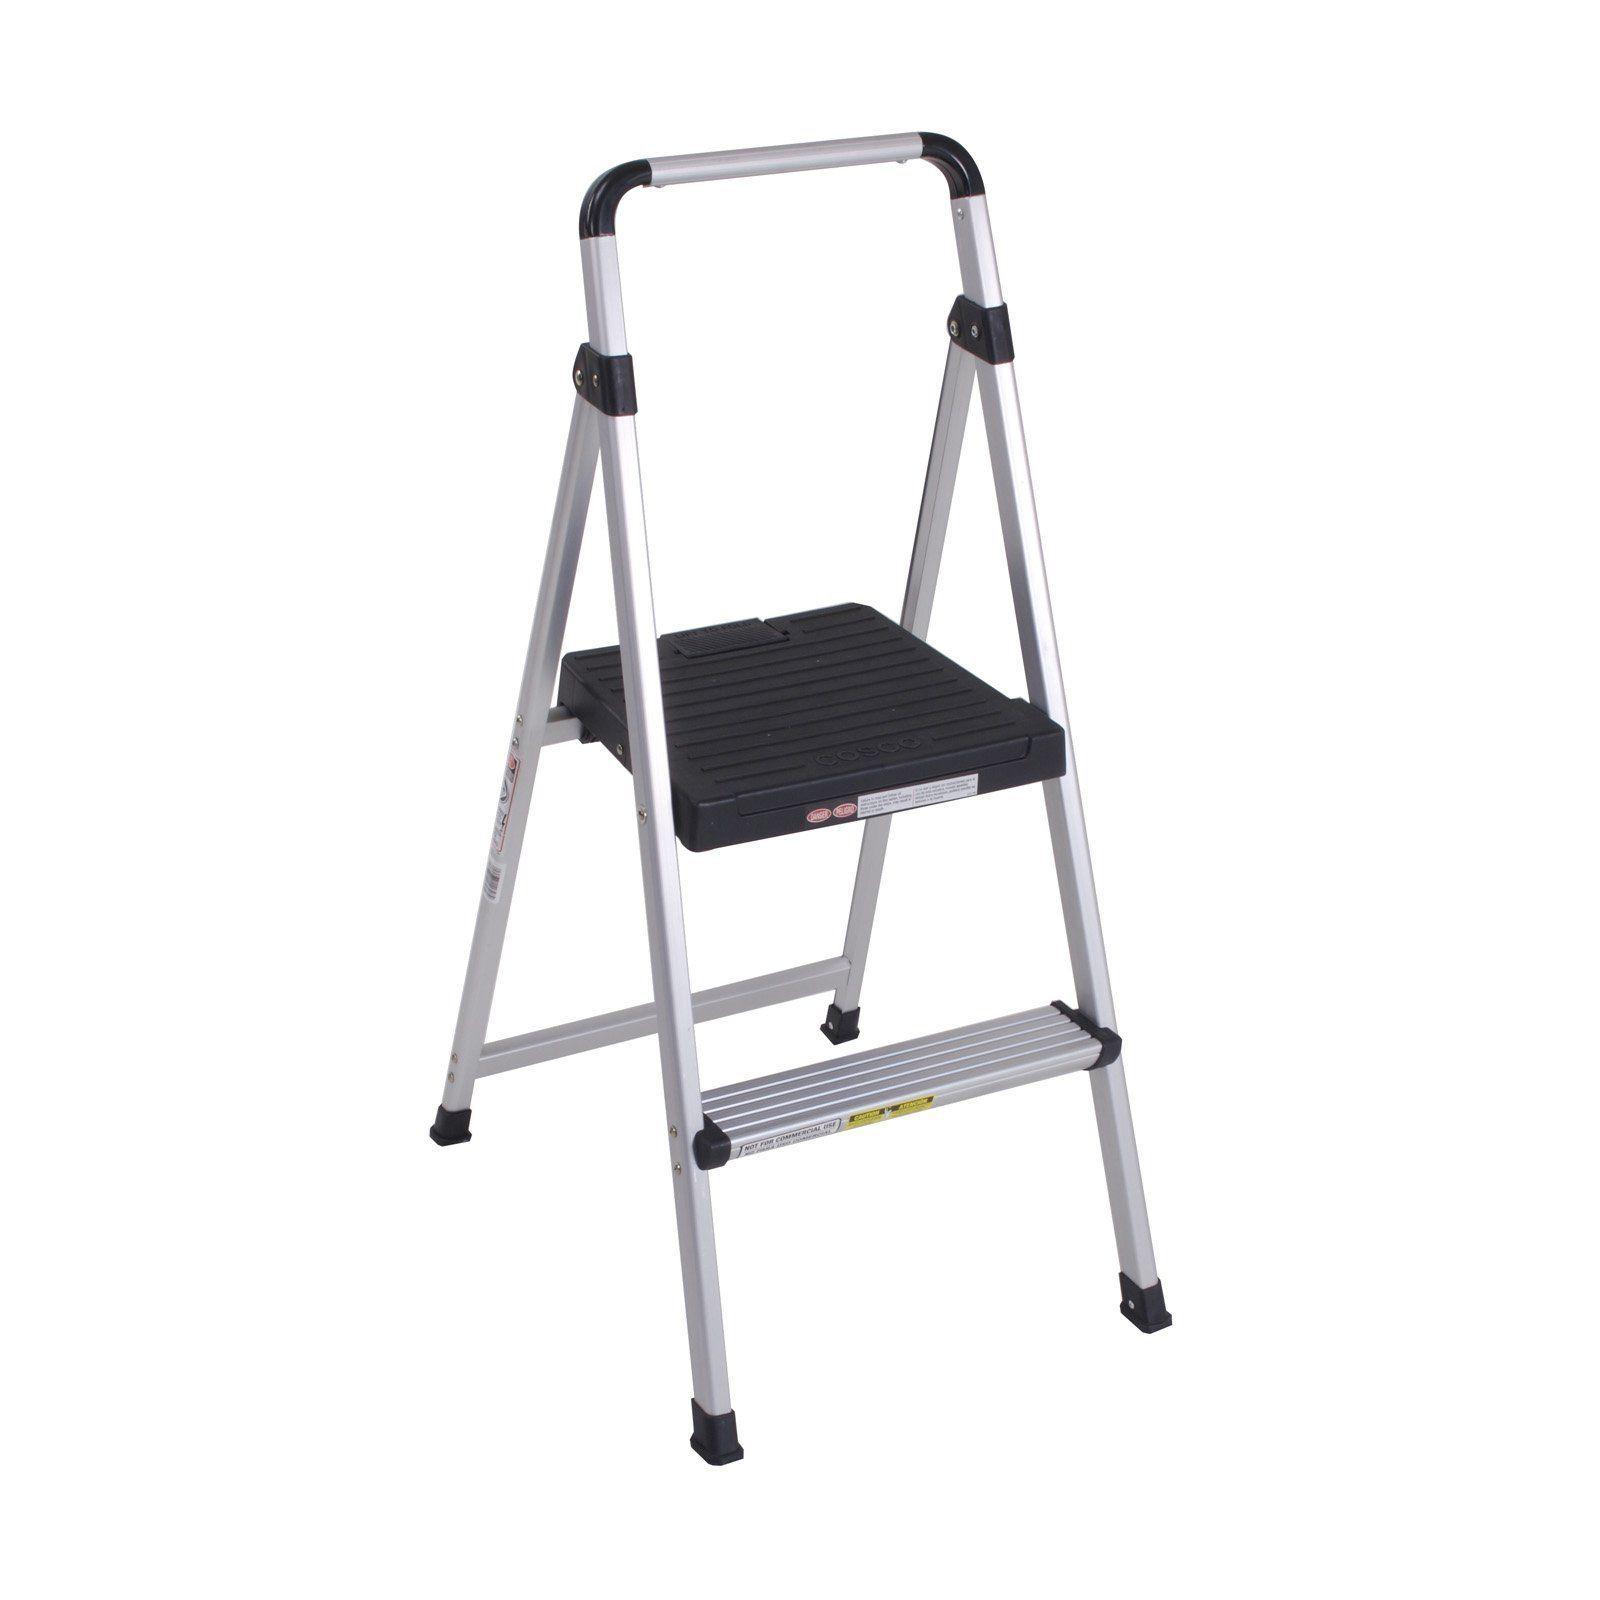 Cosco 2 Step Lite Solutions Folding Step Stool 11628abk1 Folding Step Stool Step Stool Step Ladders